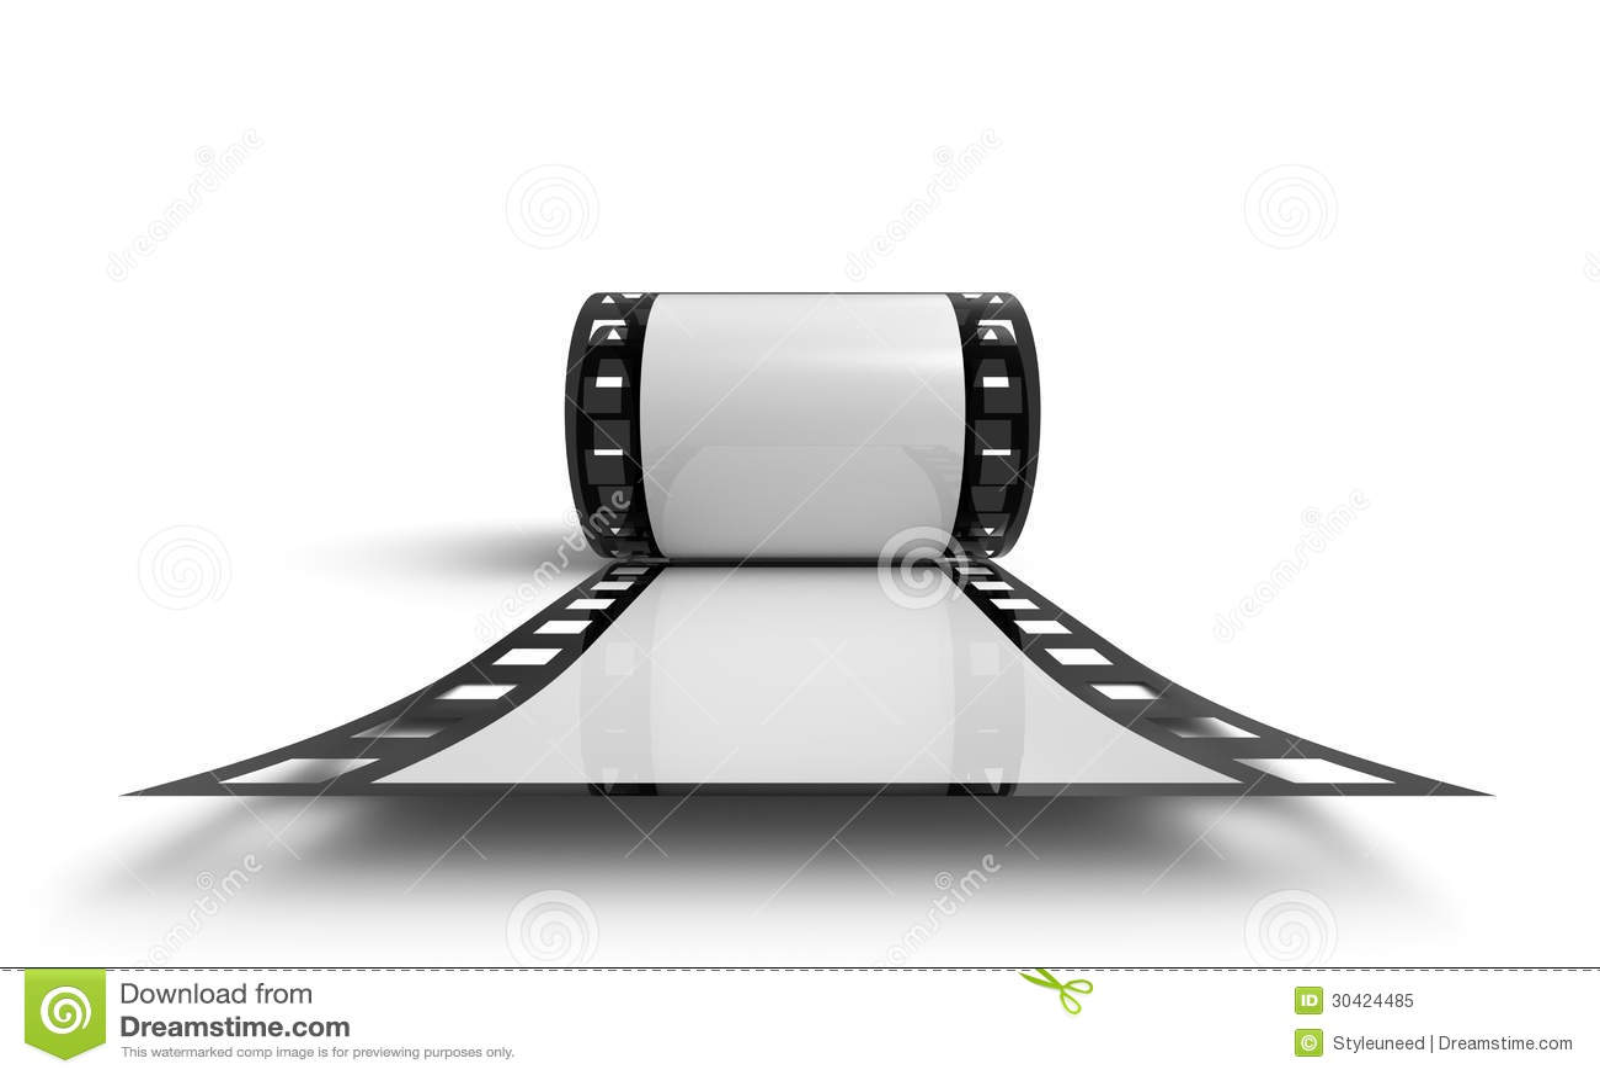 Roll of negative film